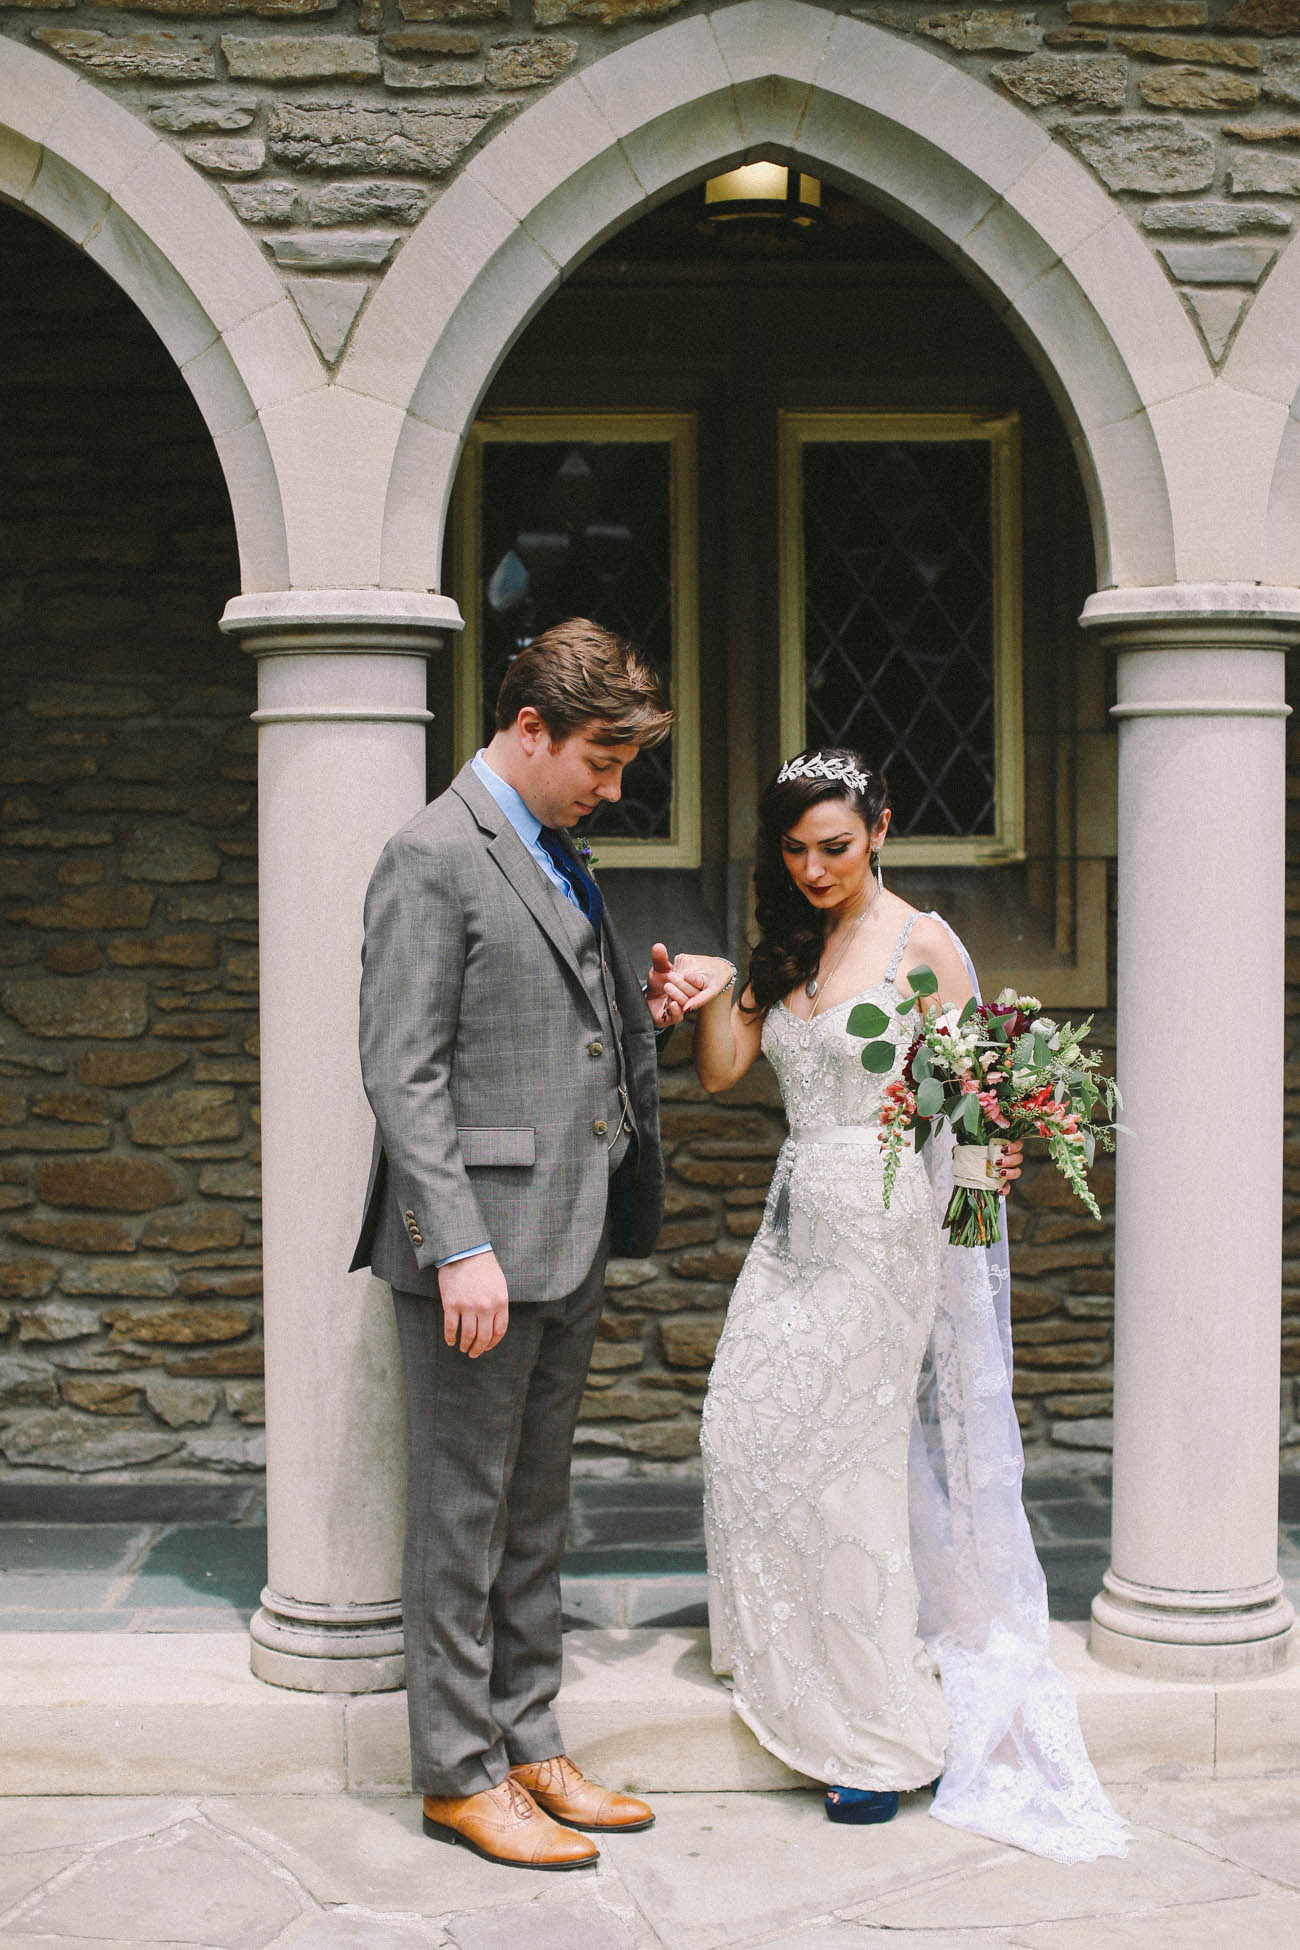 Speakeasy-1920s-theme-Louisville-and-Lexington Wedding-55.jpg